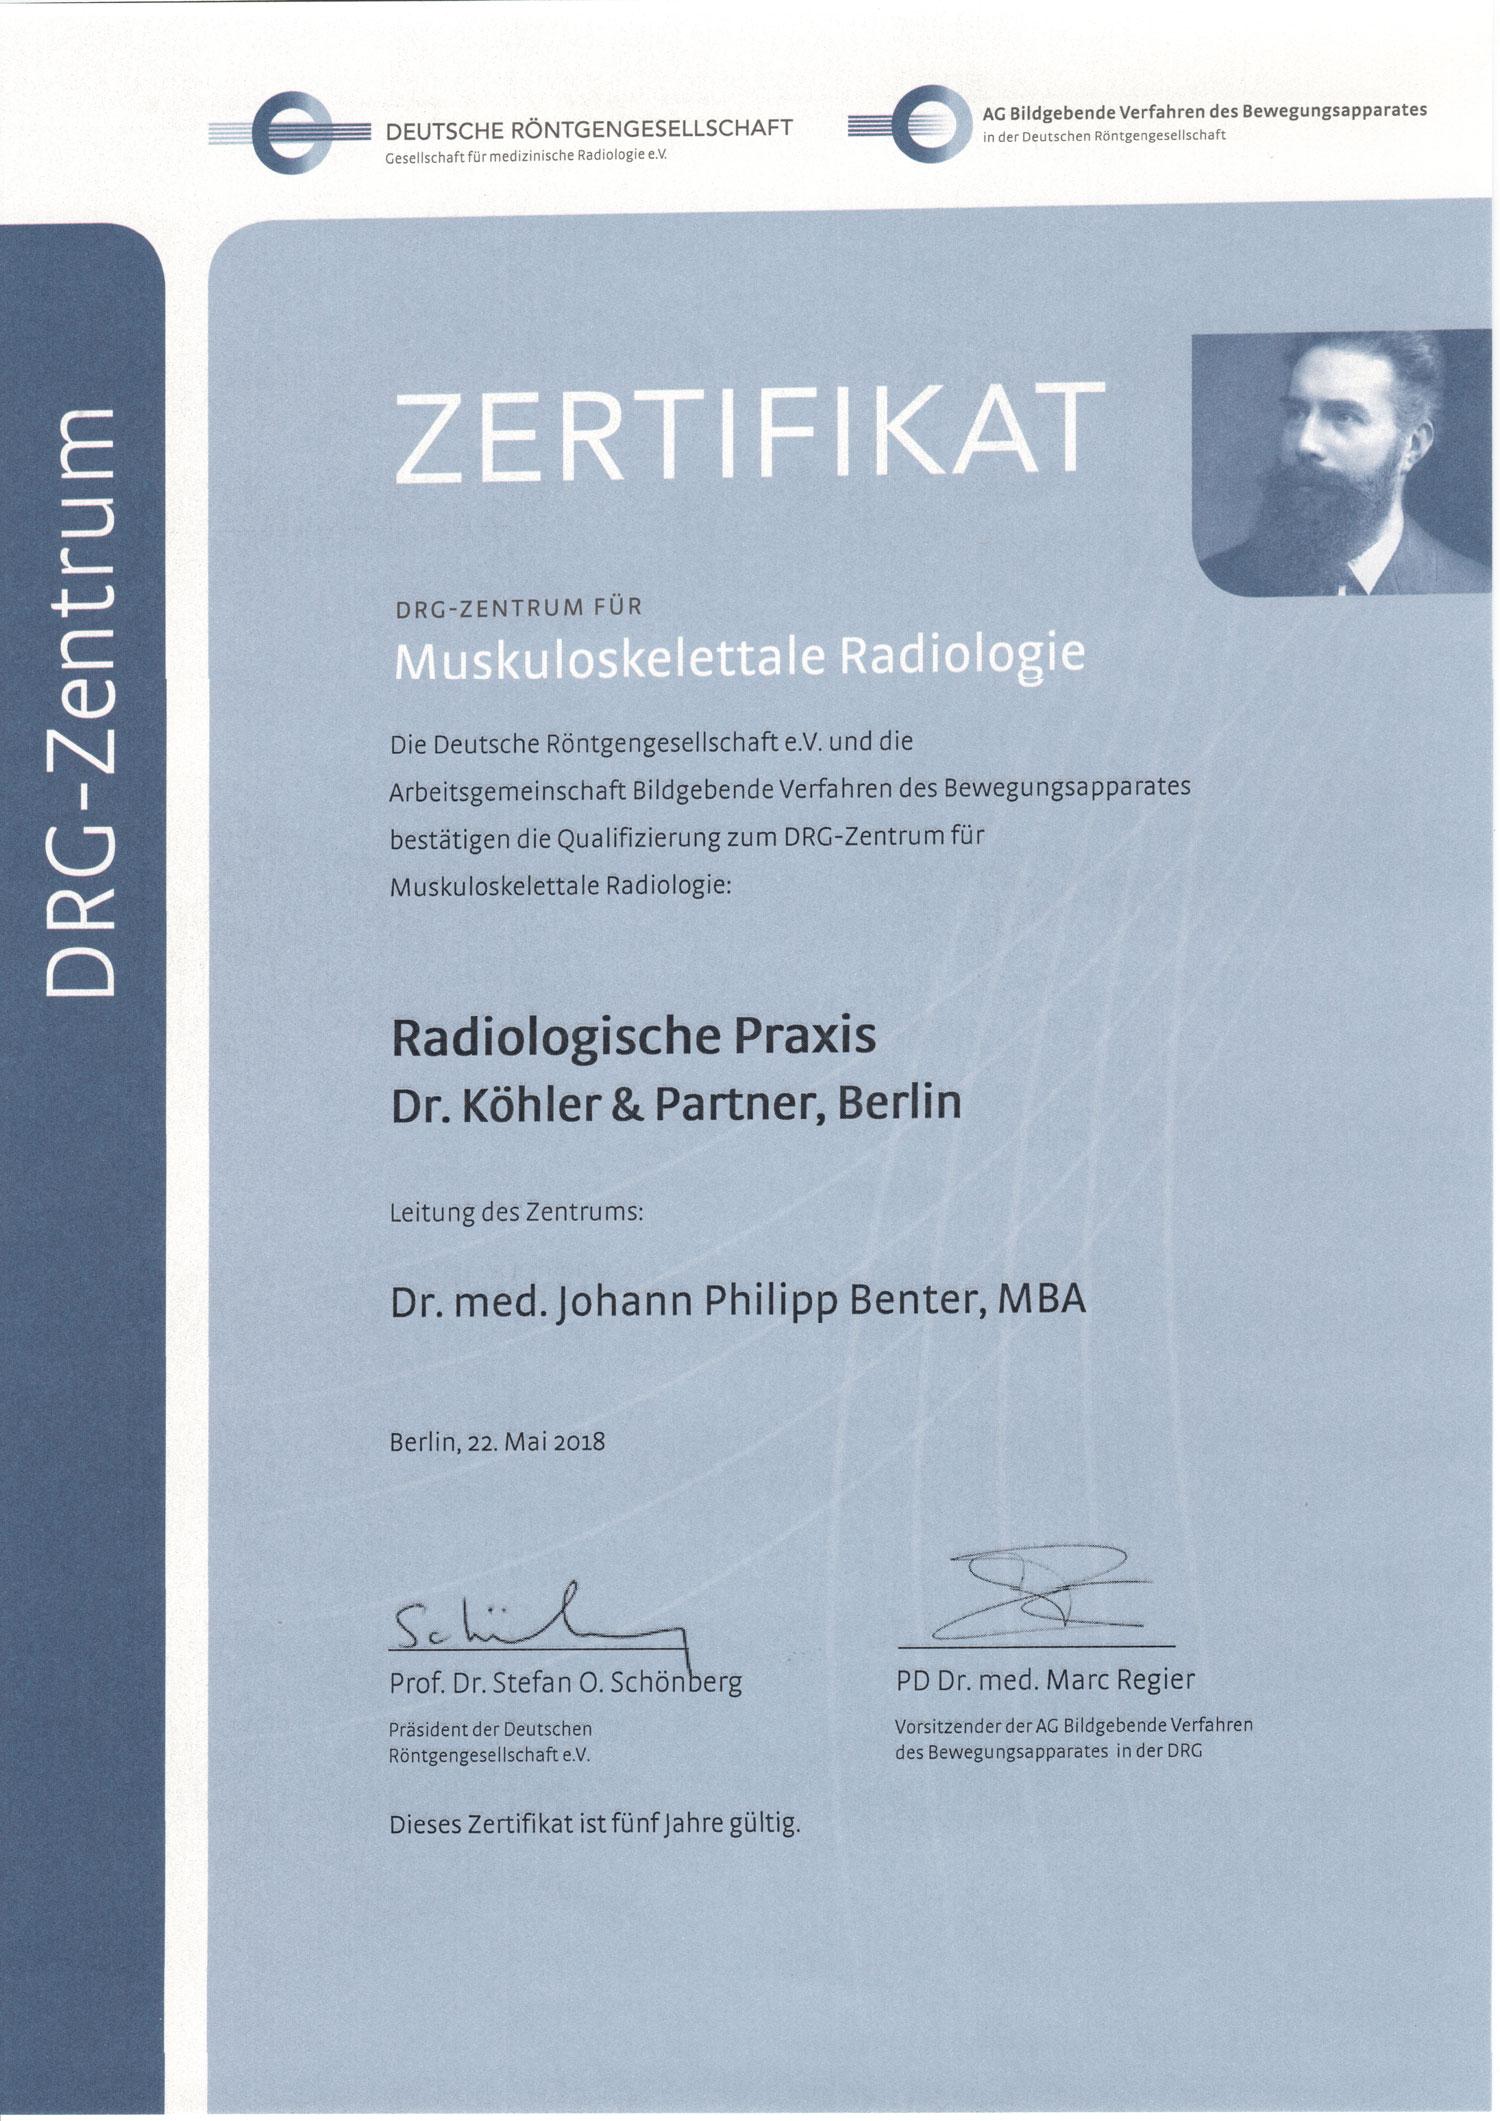 Zertifikat-optimiert